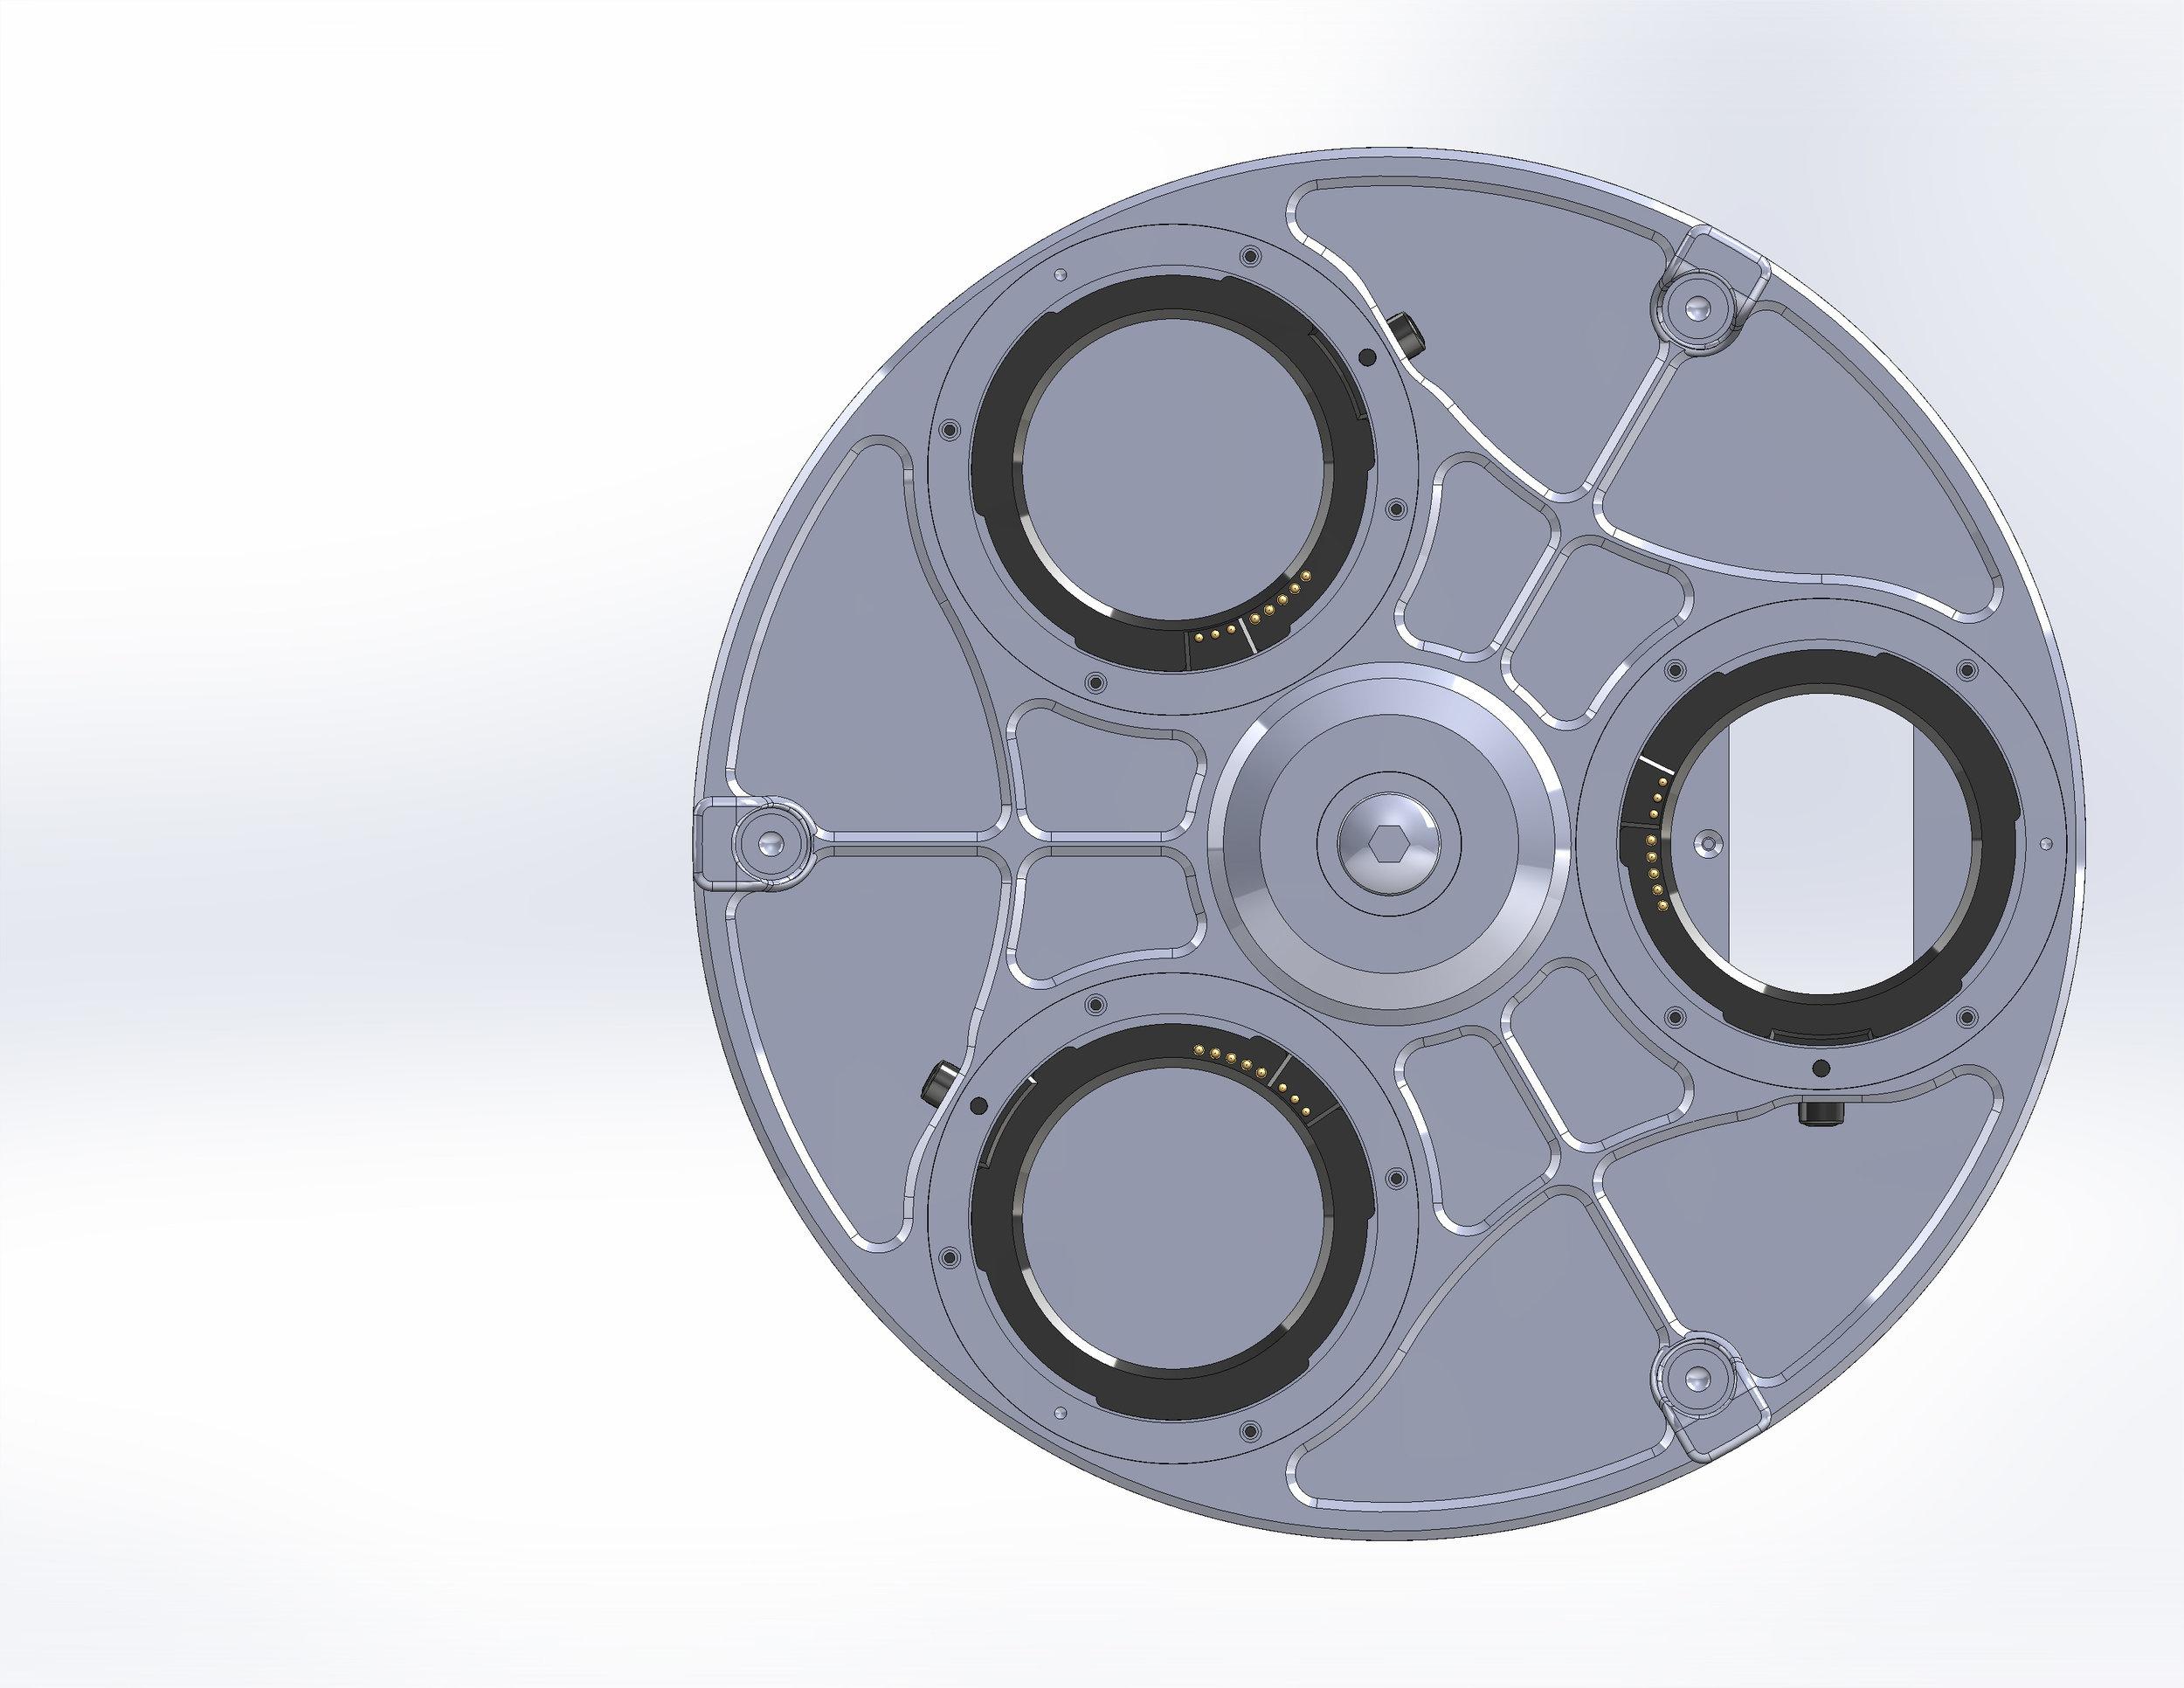 Lens Turret v4c - front.JPG